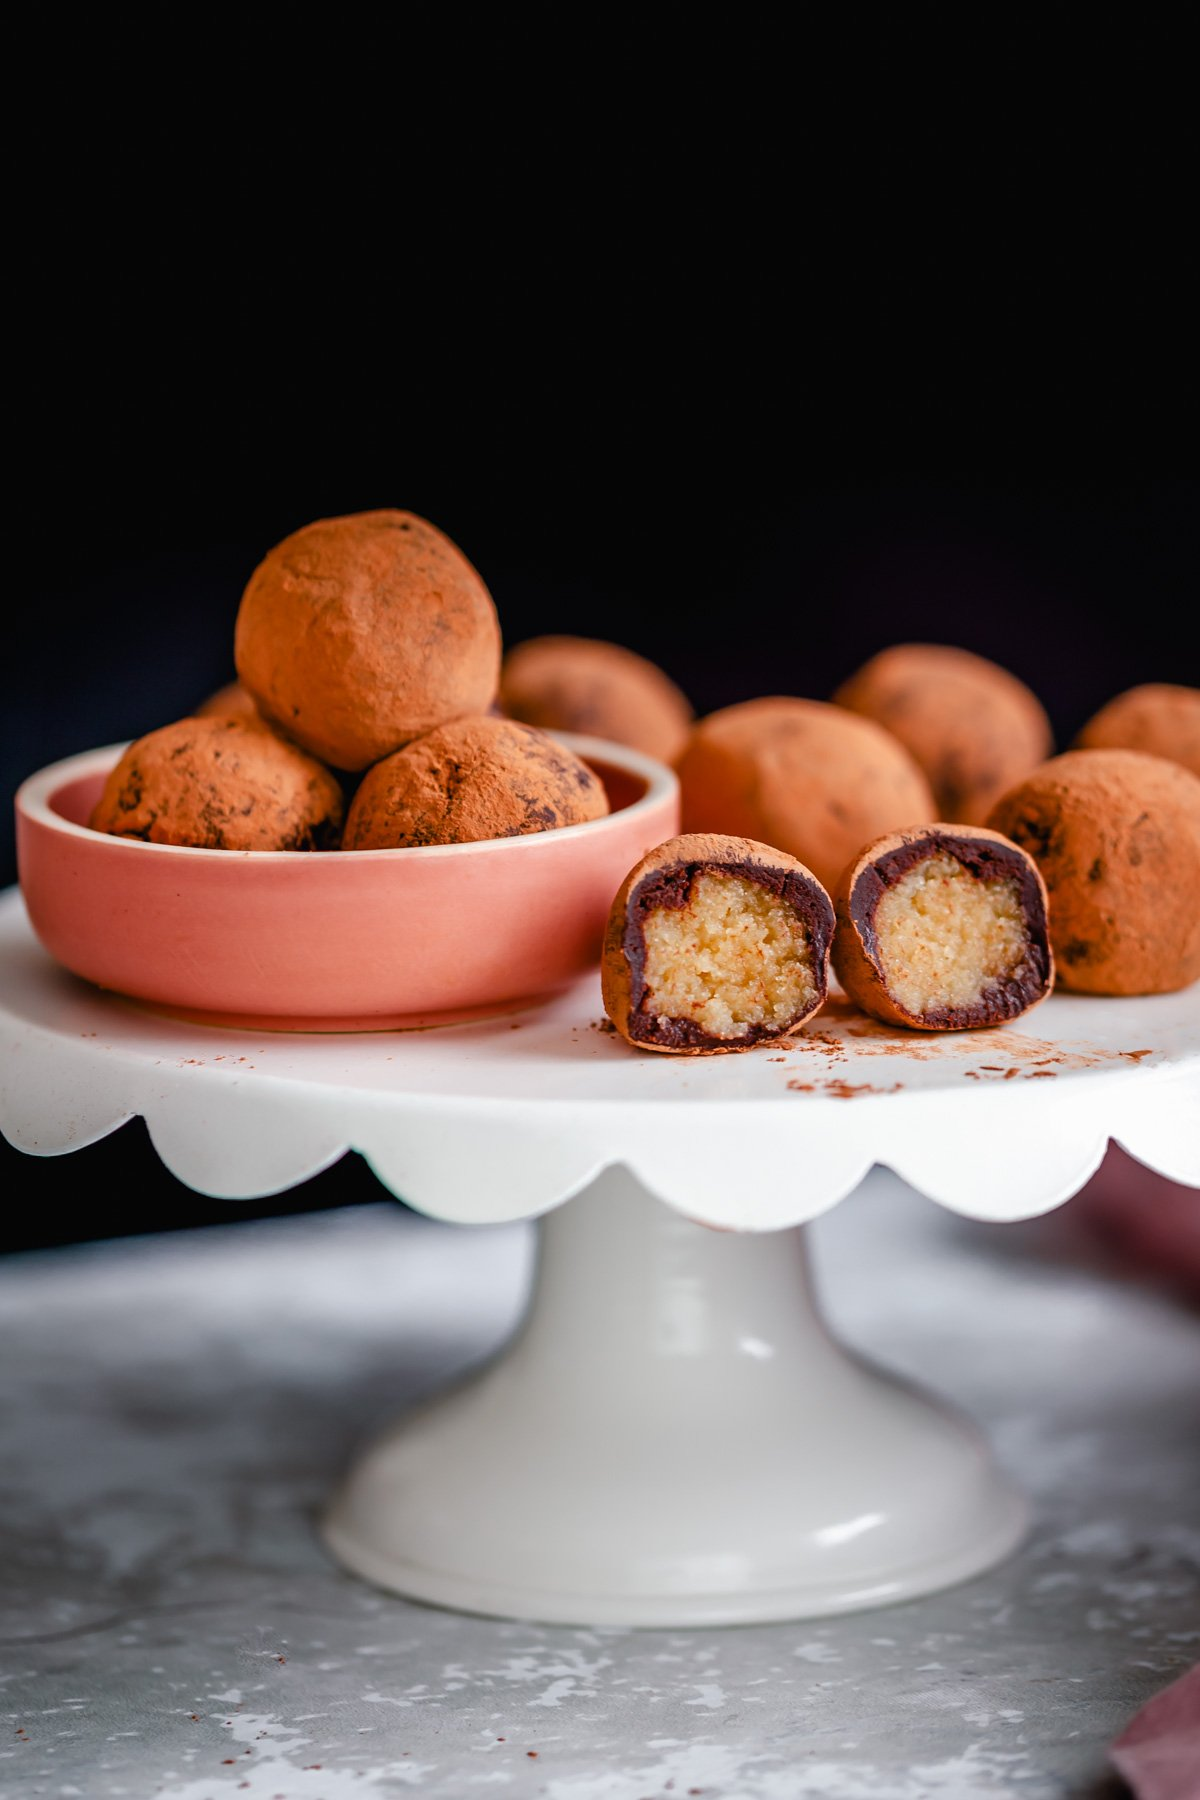 vegan tiramisu truffles on a cake stand with one truffle cut open